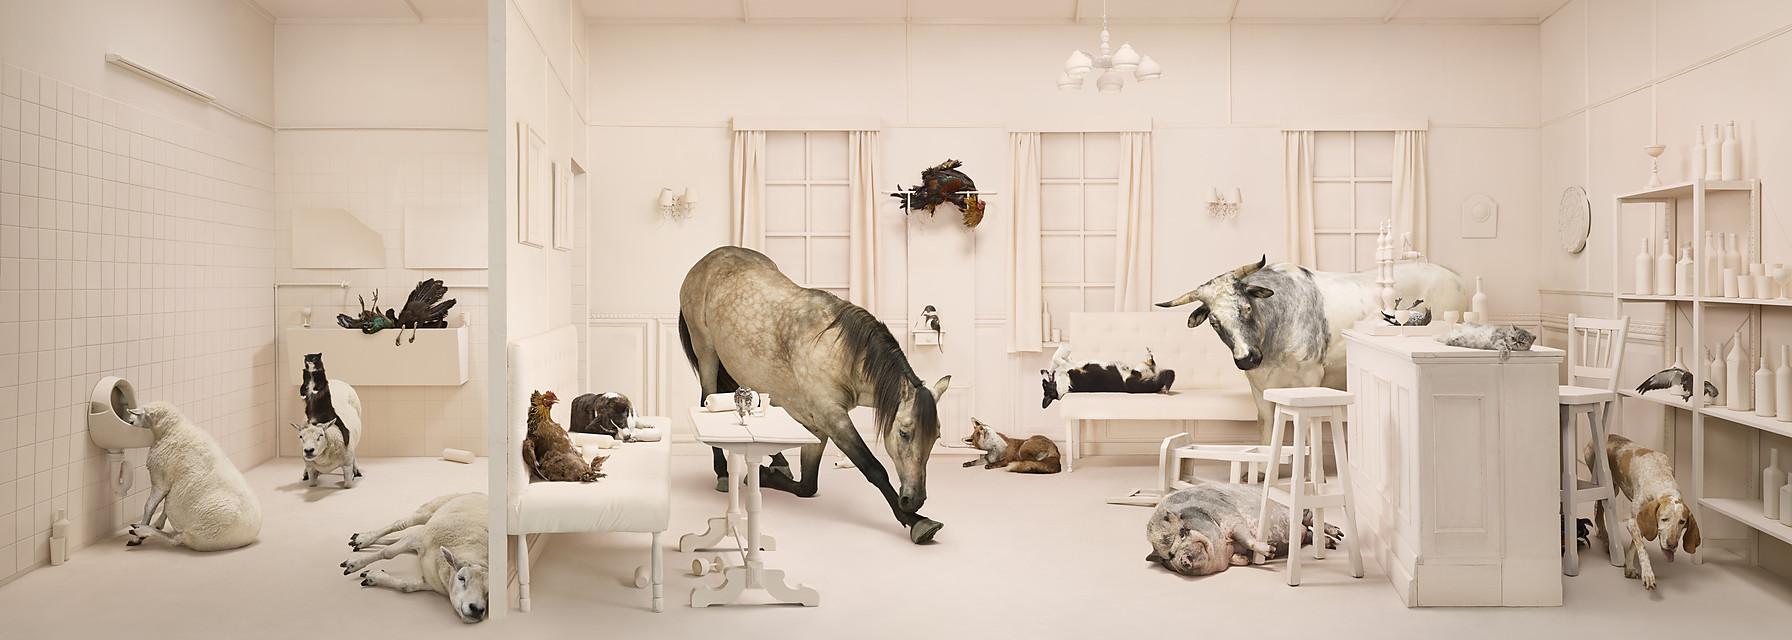 ANIMALCOHOLICS (9 pics)